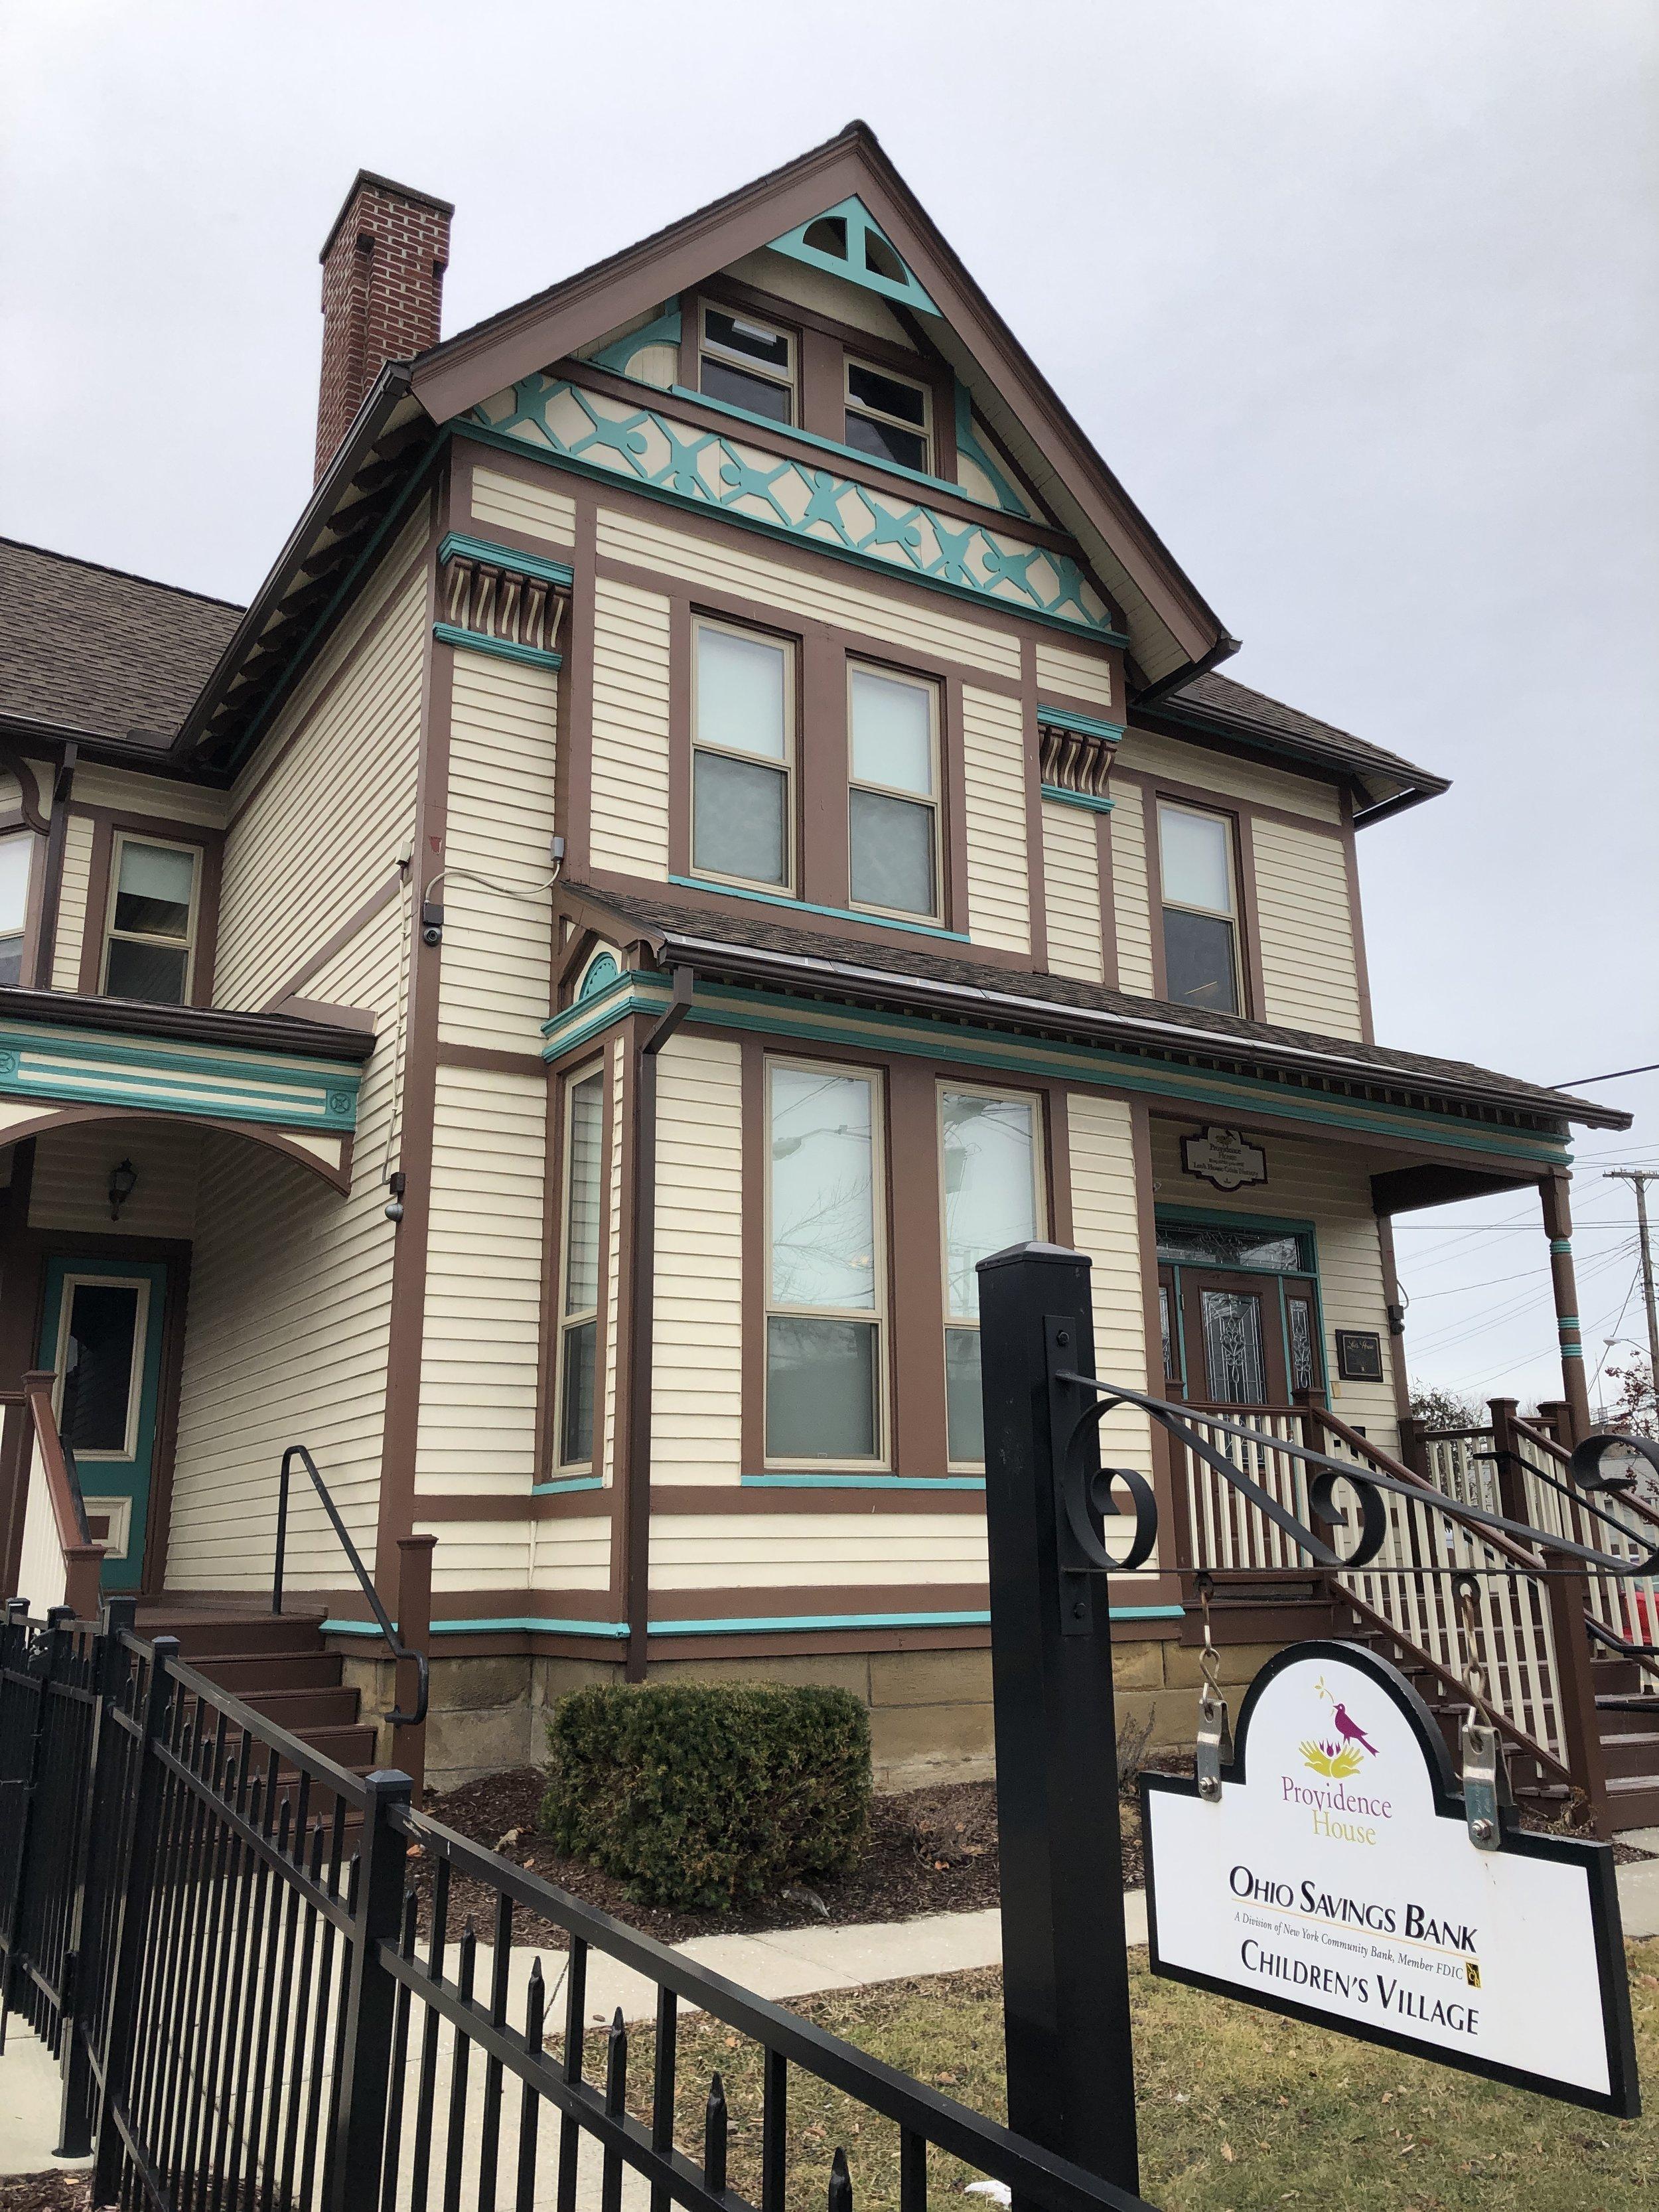 Providence House pic.JPG